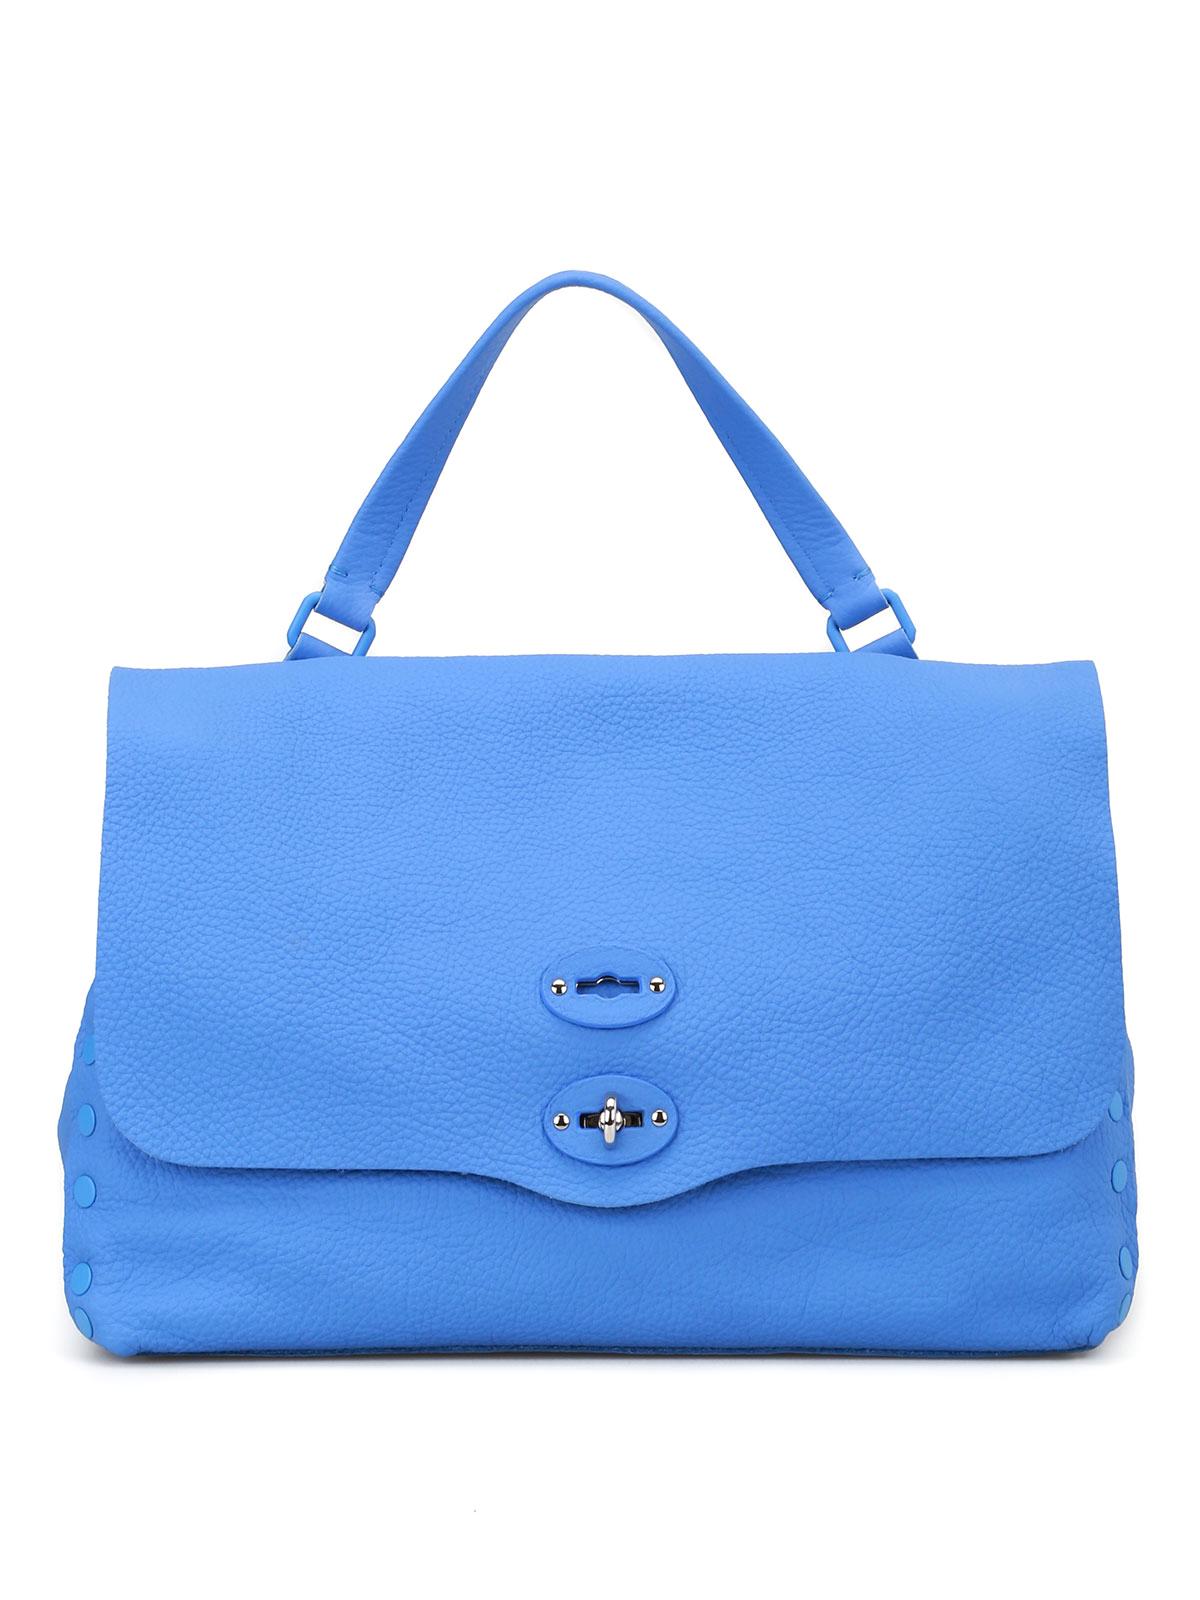 Zanellato Burano blu Postina M Cashmere Pura l5RMNh